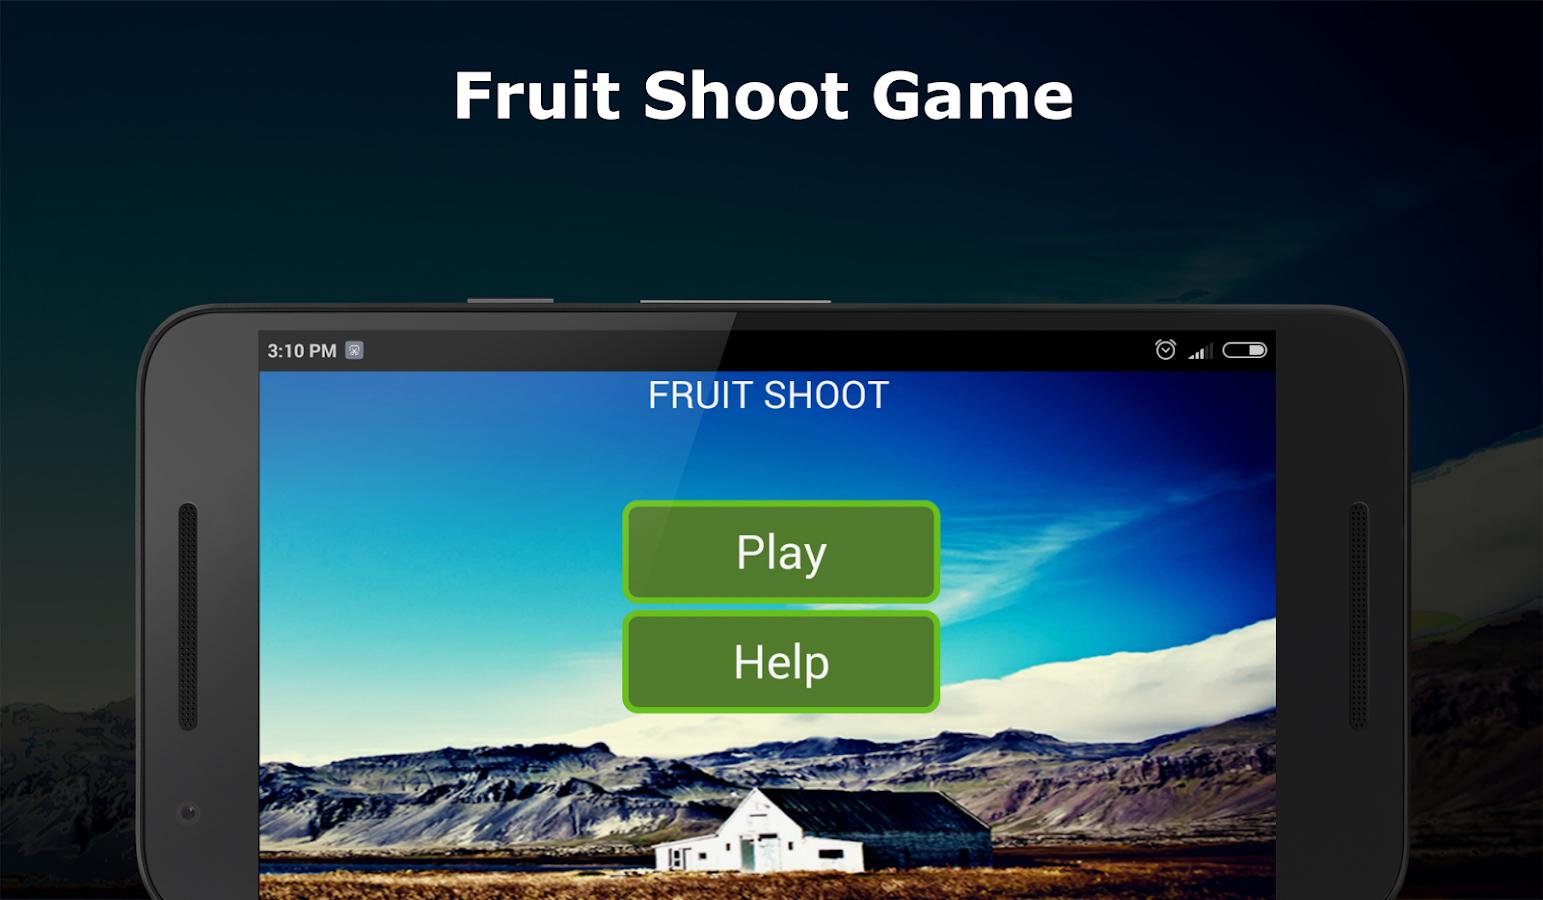 Fruit shoot game - Fruit Shoot Shoot Angry Fruits Screenshot